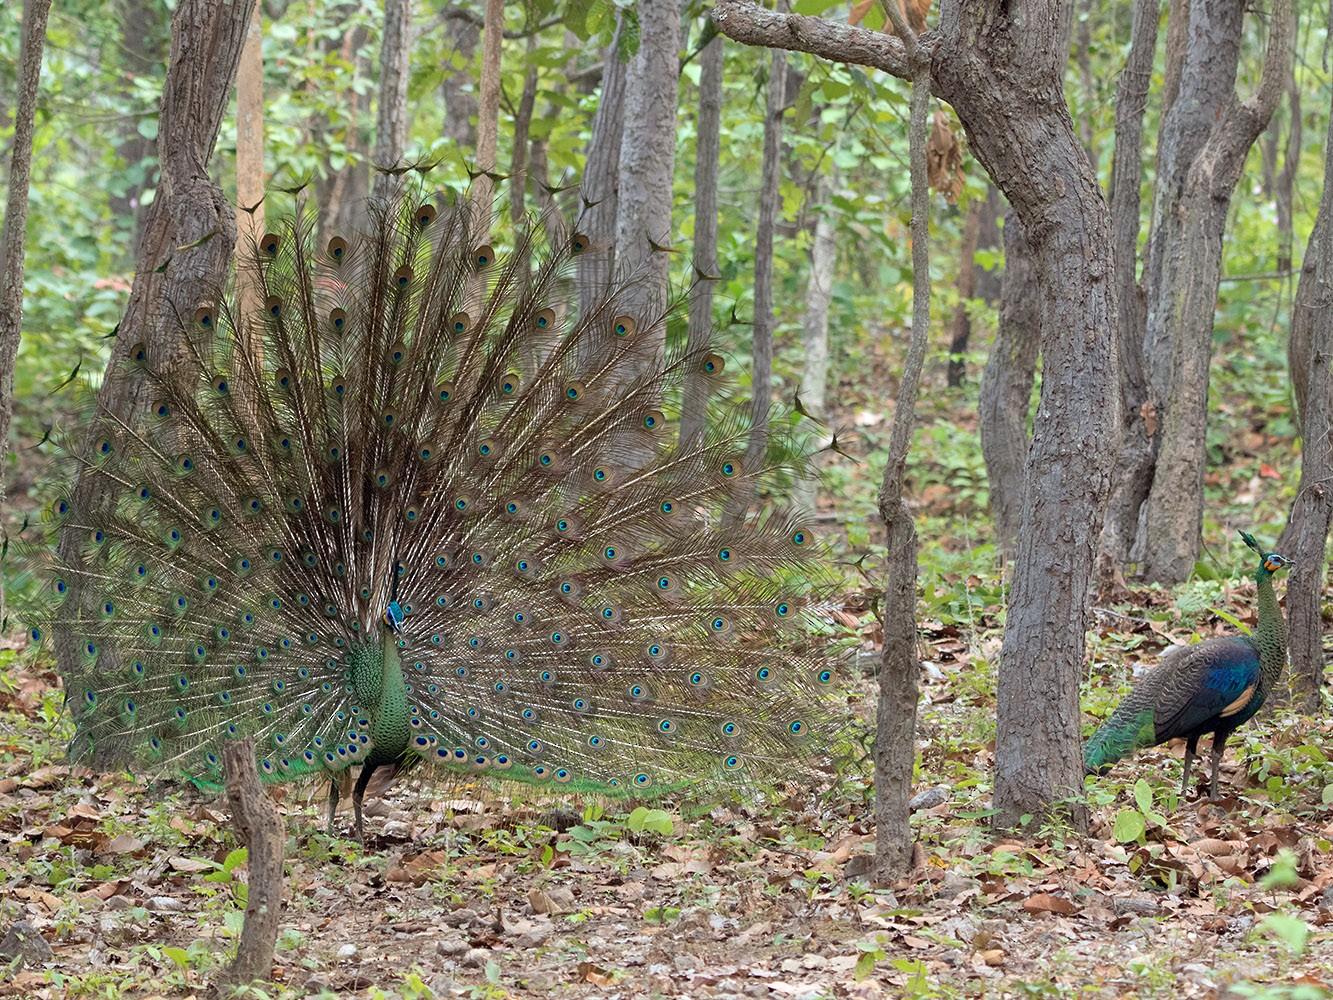 Green Peafowl - Ayuwat Jearwattanakanok